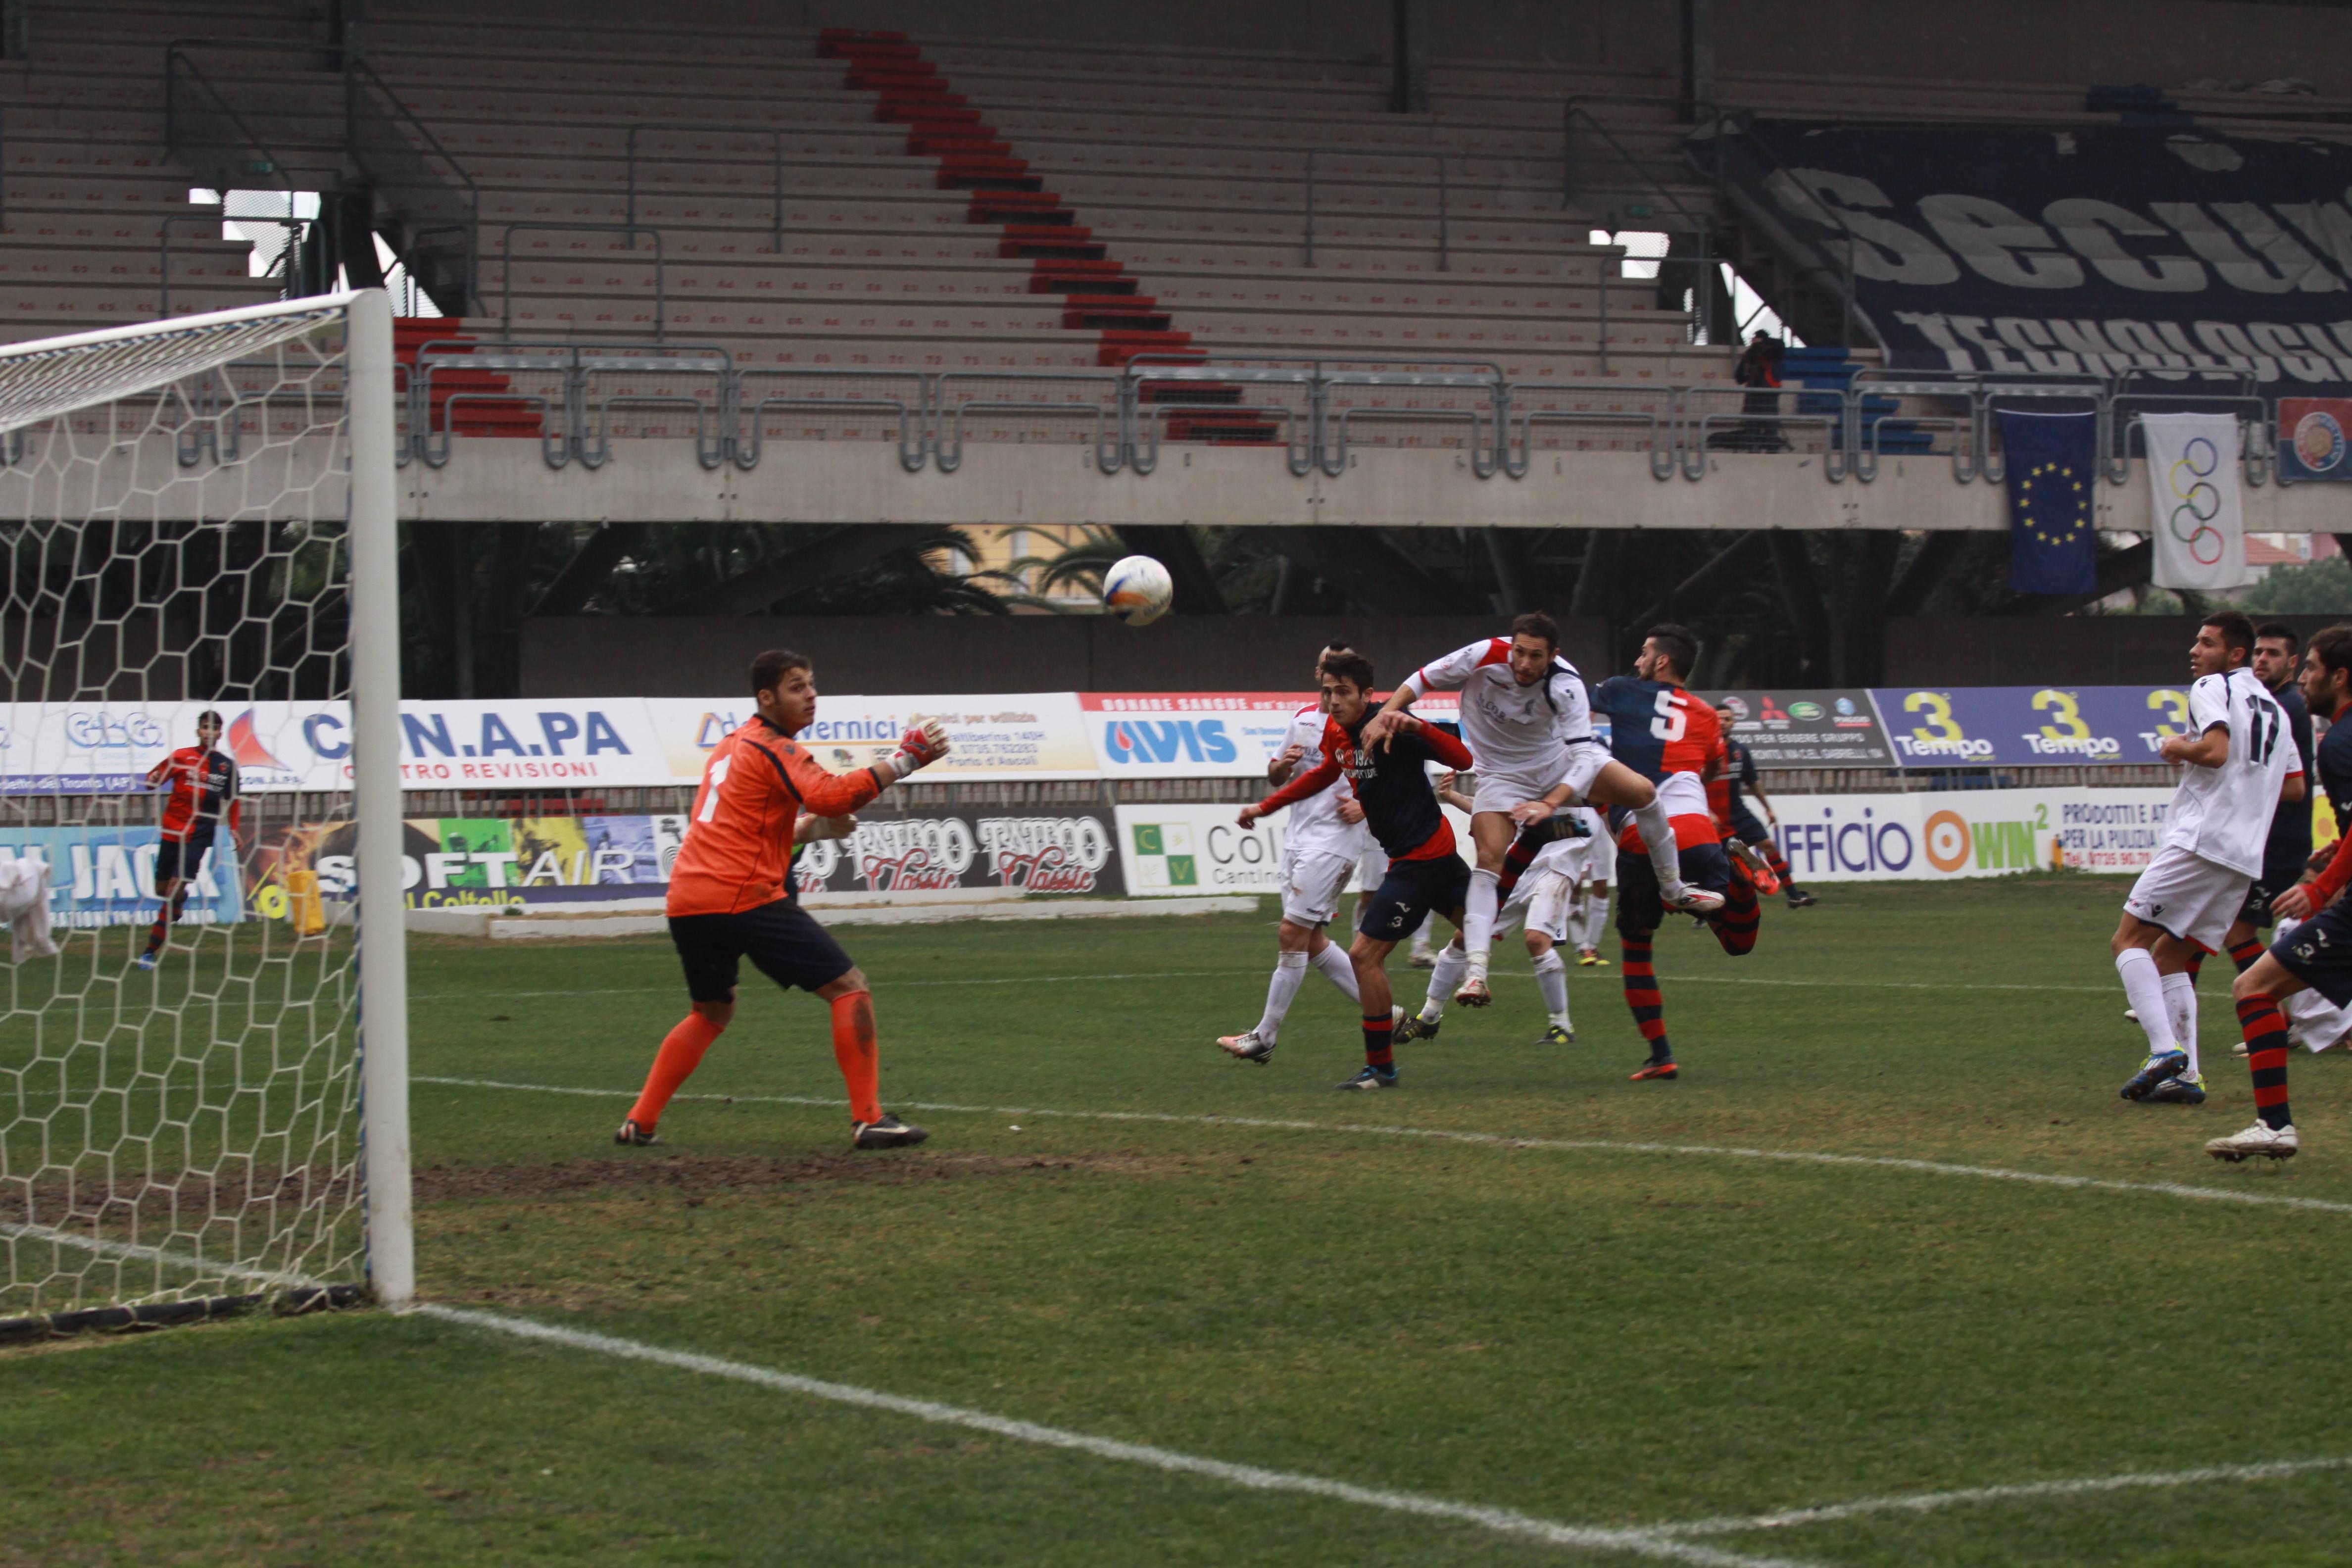 Samb-San Cesareo, il gol di Gianluca Carpani (bianchini)